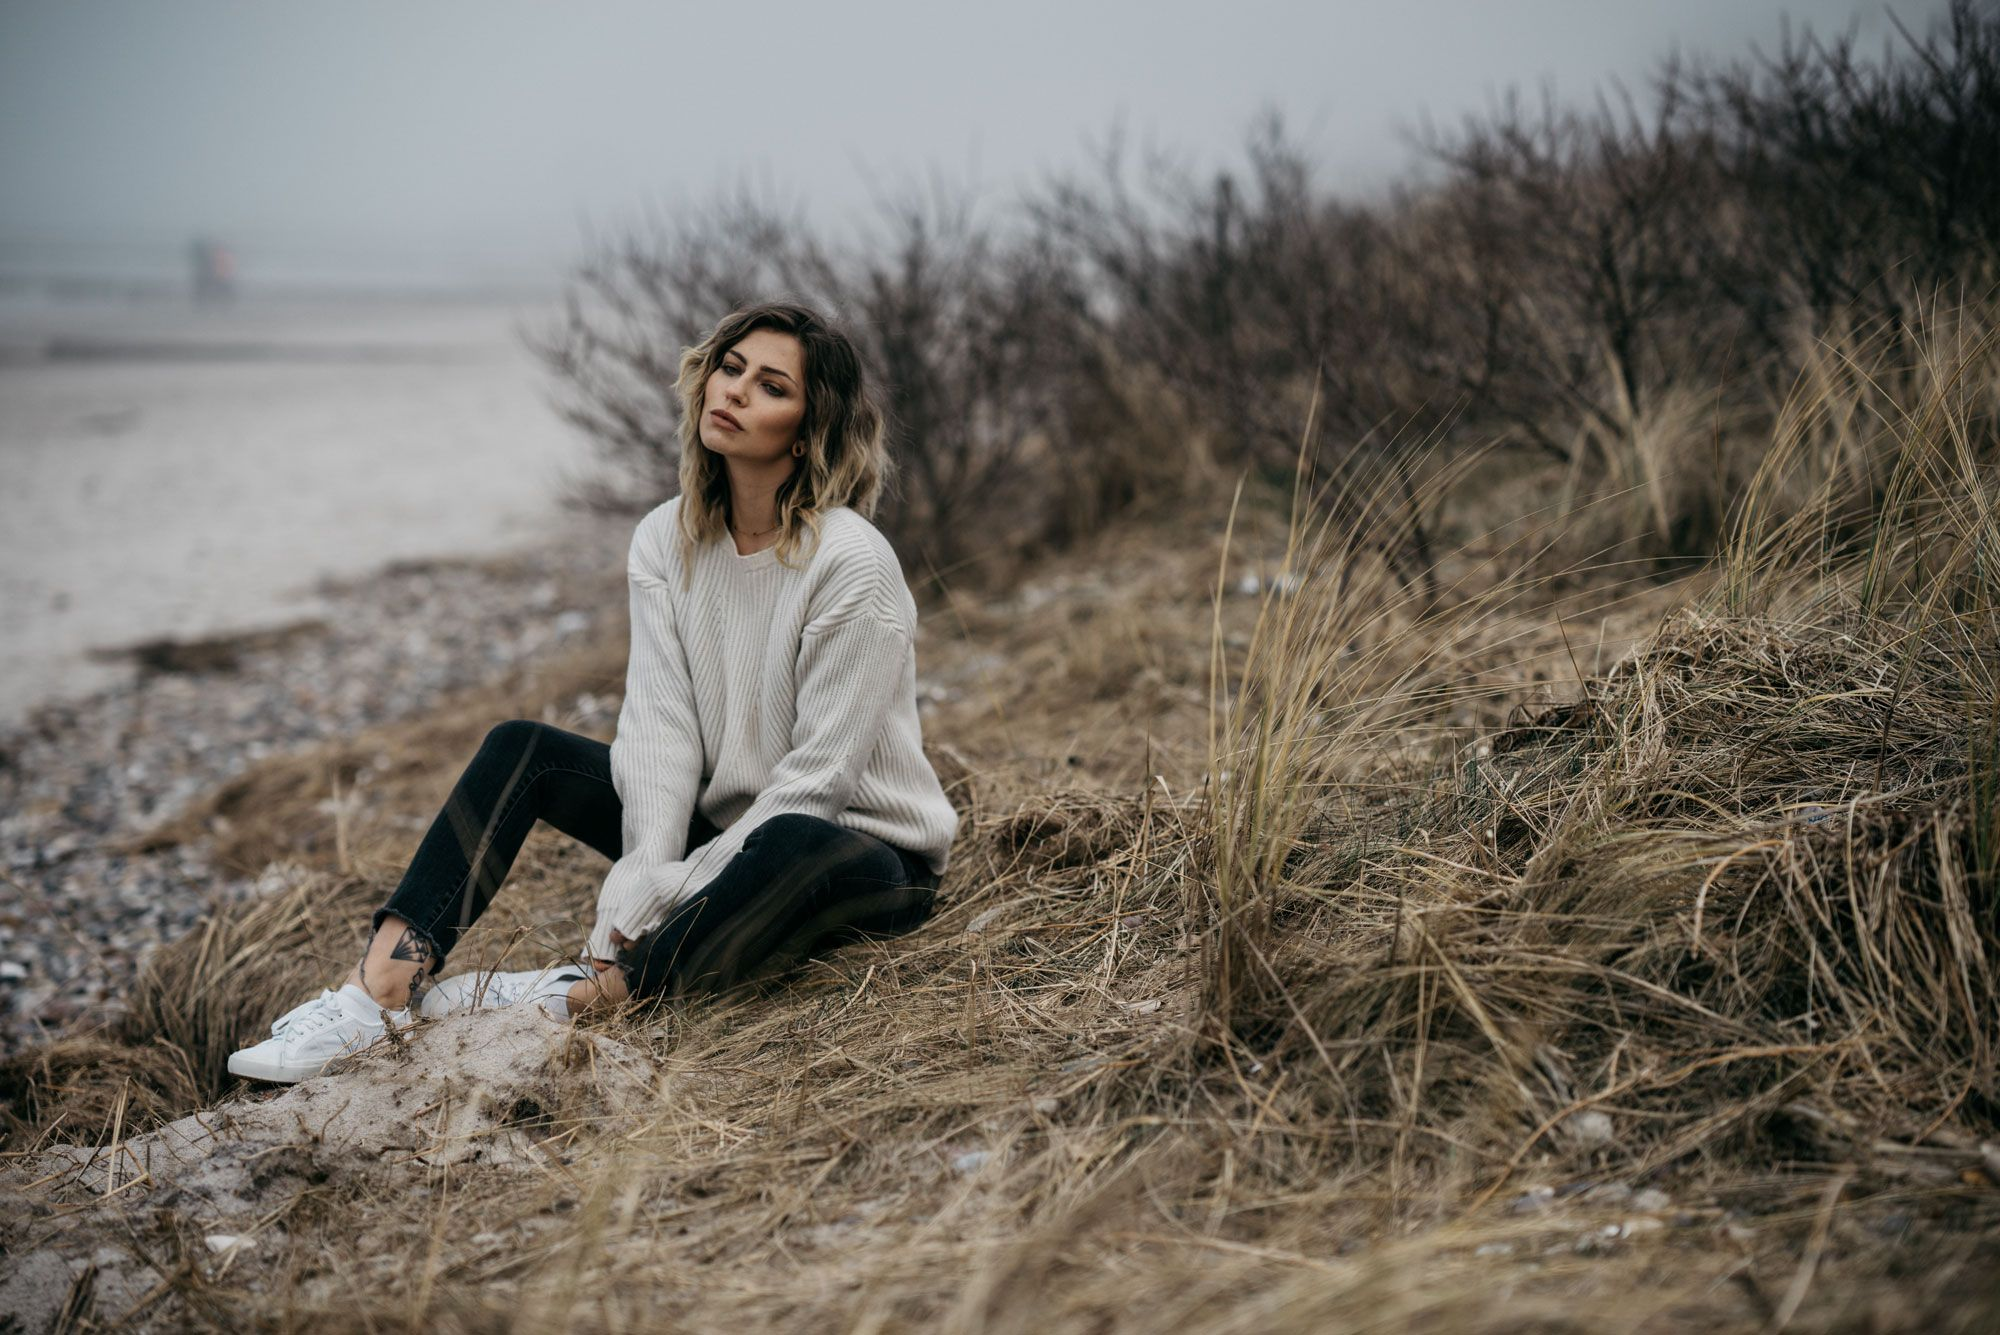 Baltic Sea Fashion Editorial | style: cool, effortless, simple, nature, emotional #editorialfashion